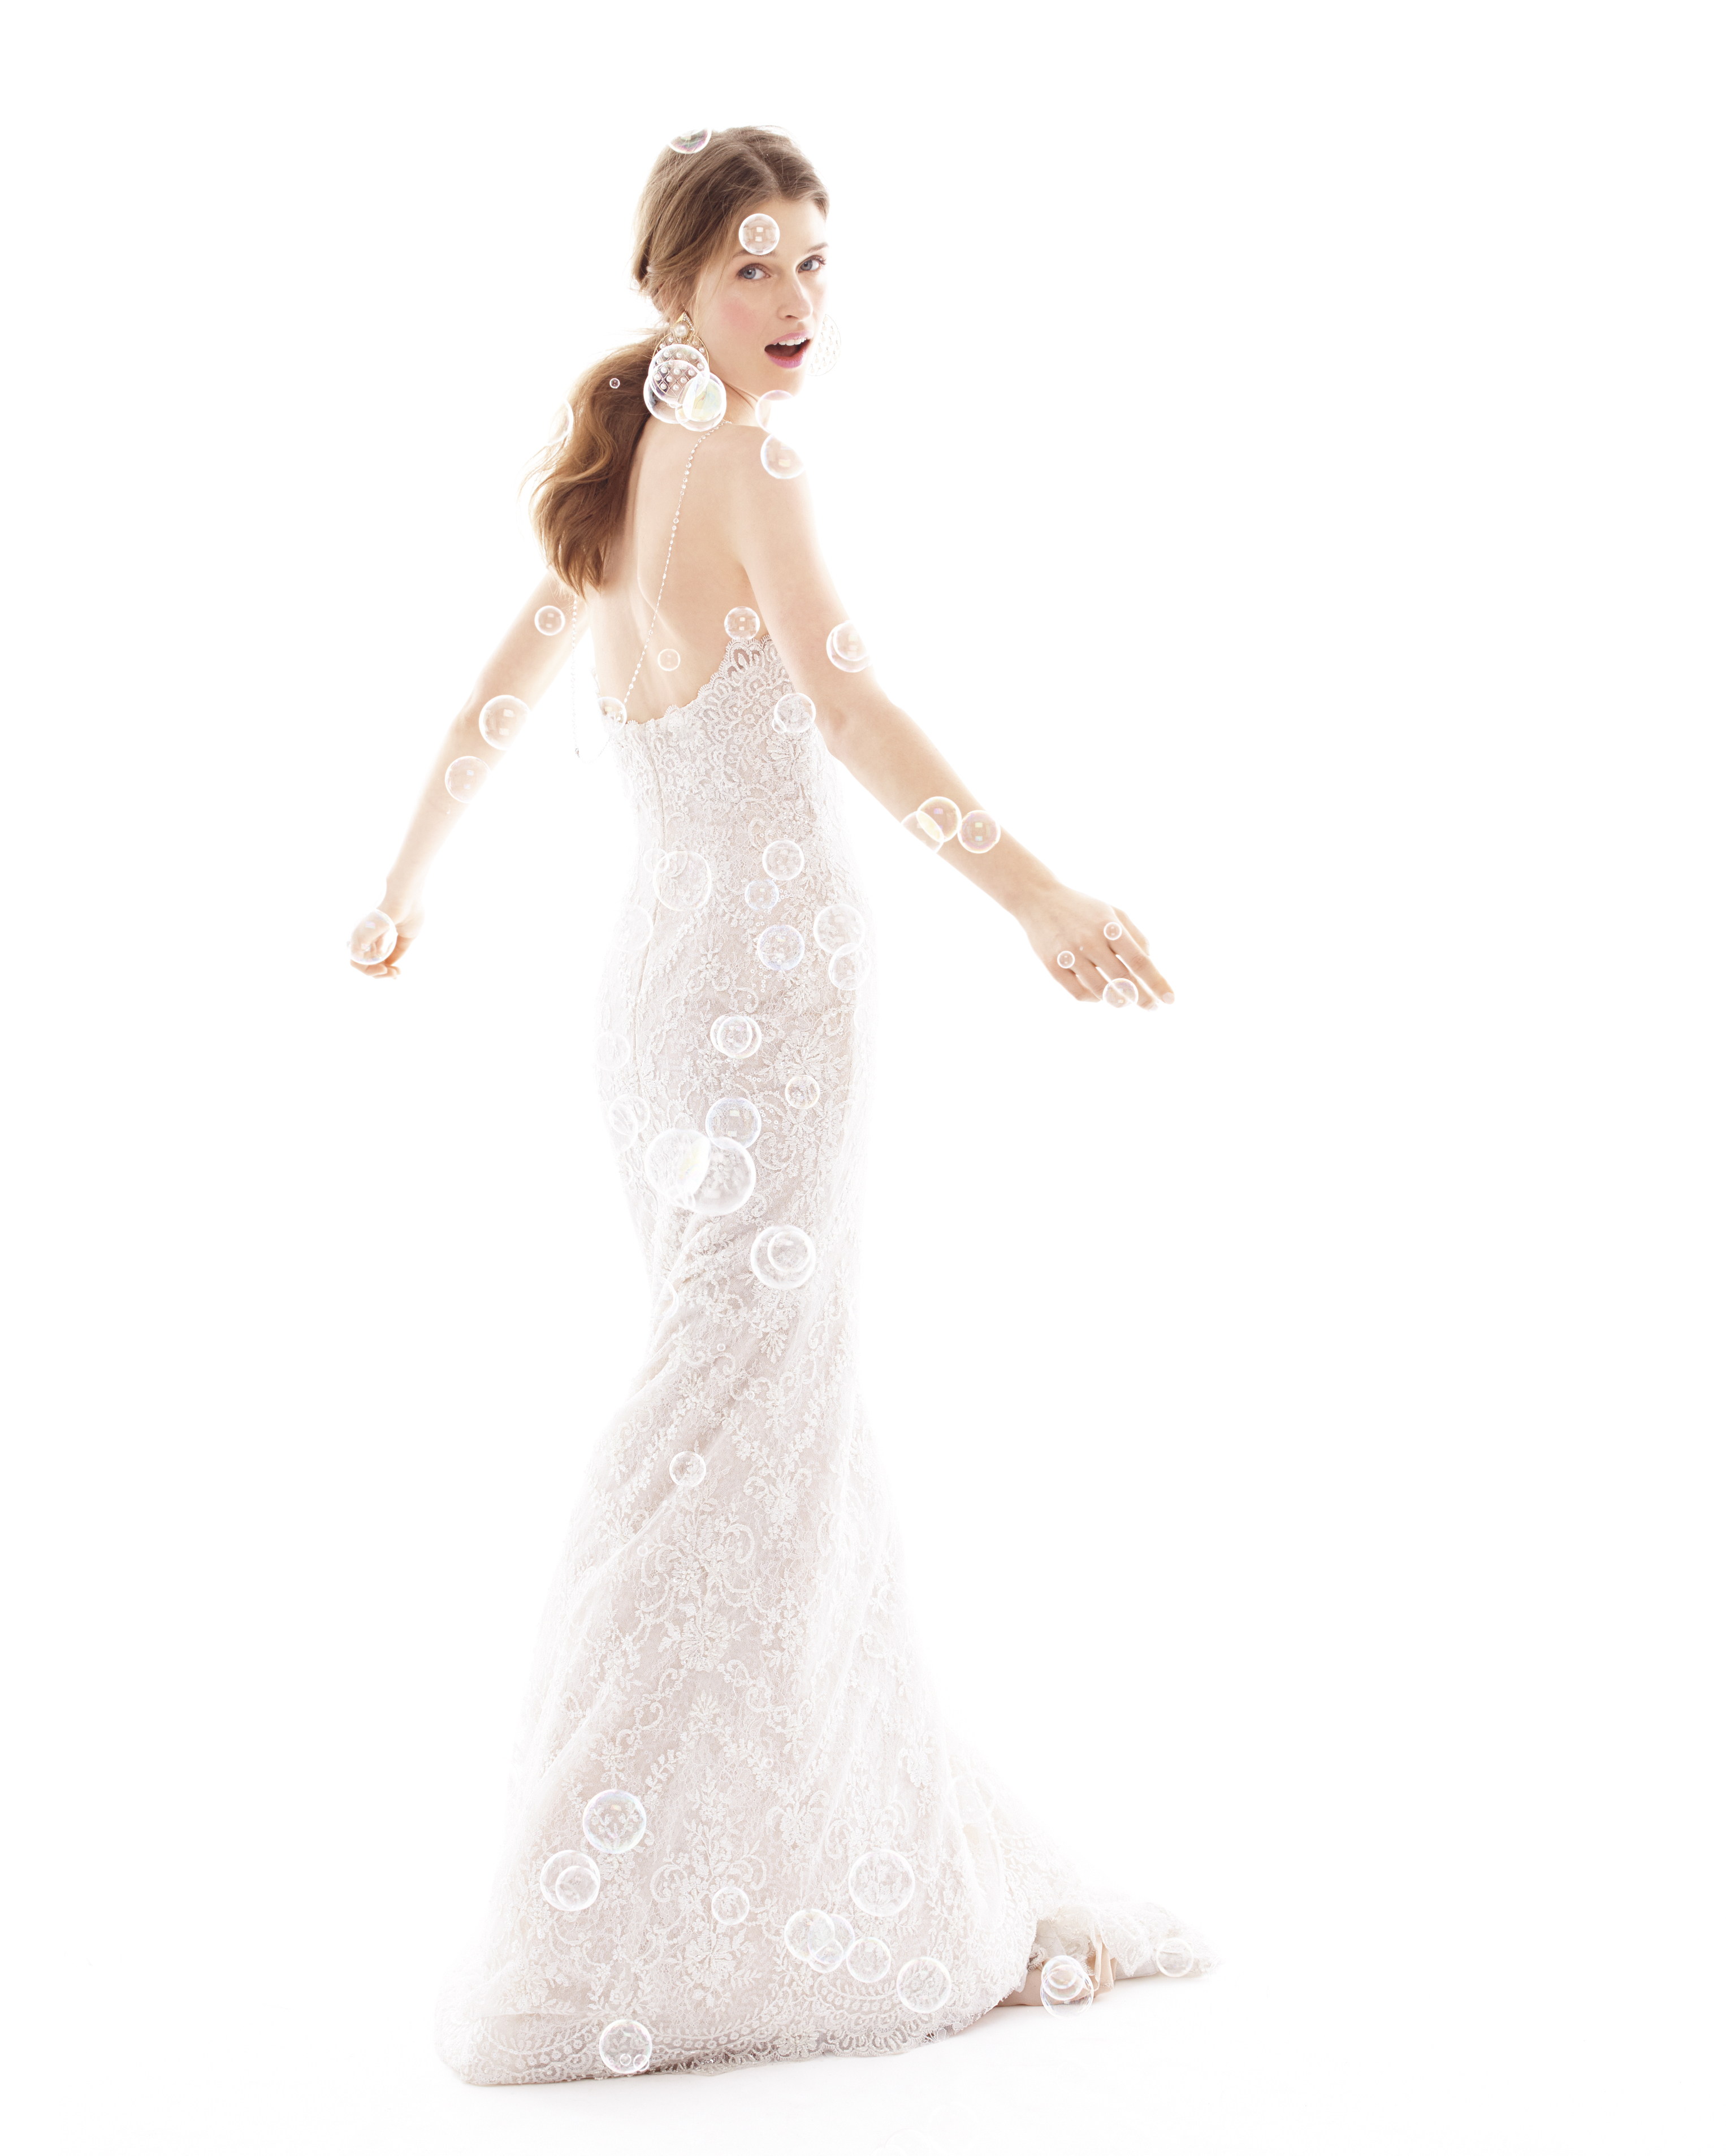 bubbles-wedding-dress-262-d111904.jpg